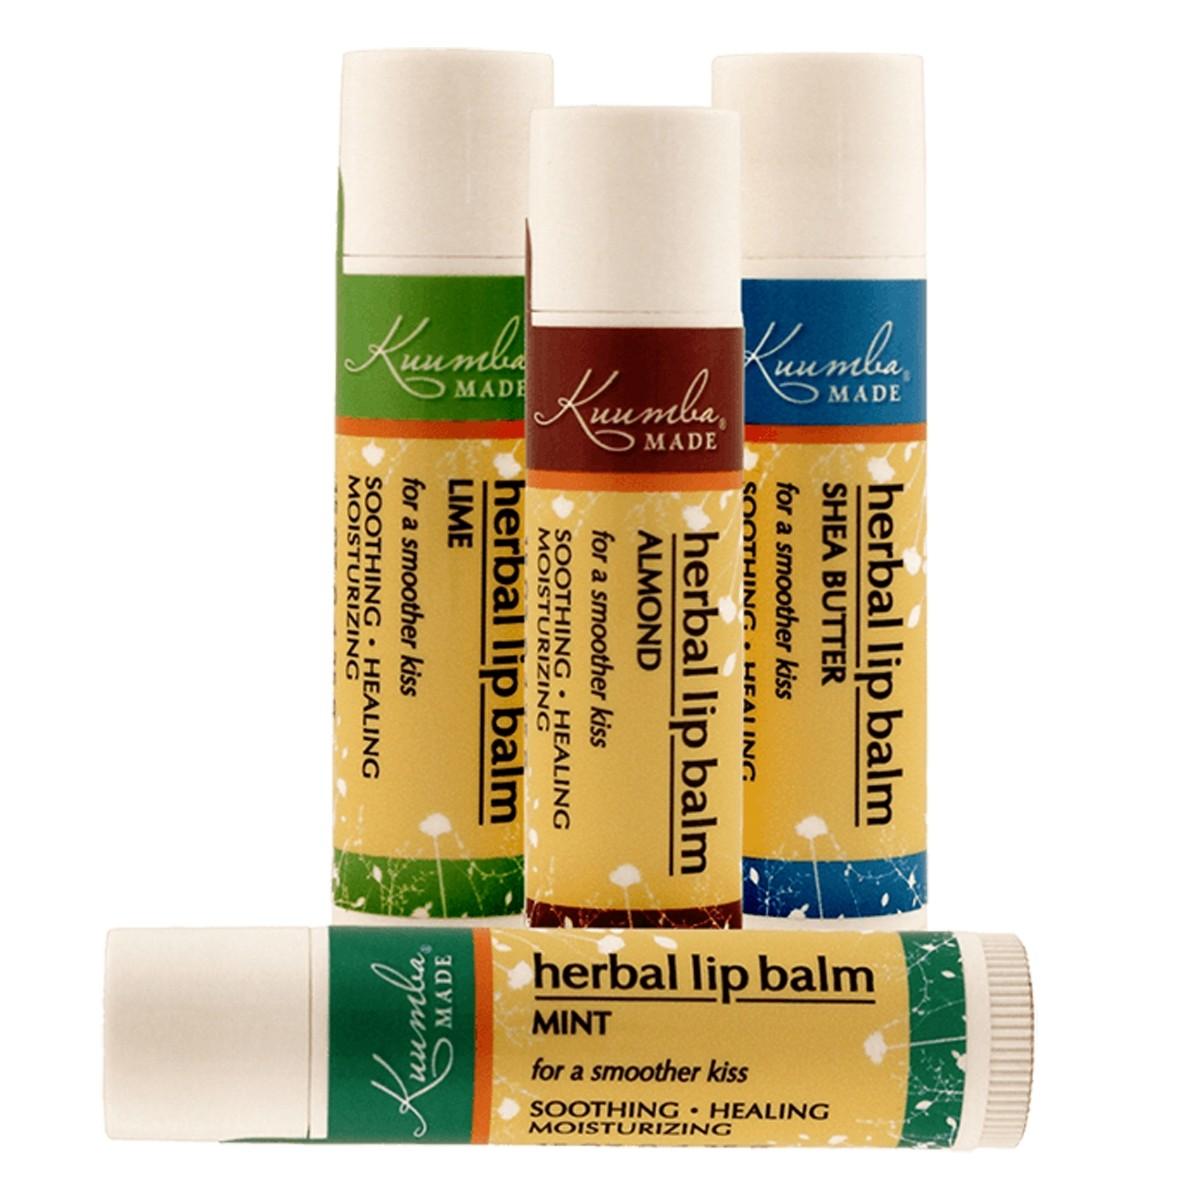 Kuumba Made Organic Flavoured Herbal Lip Balm